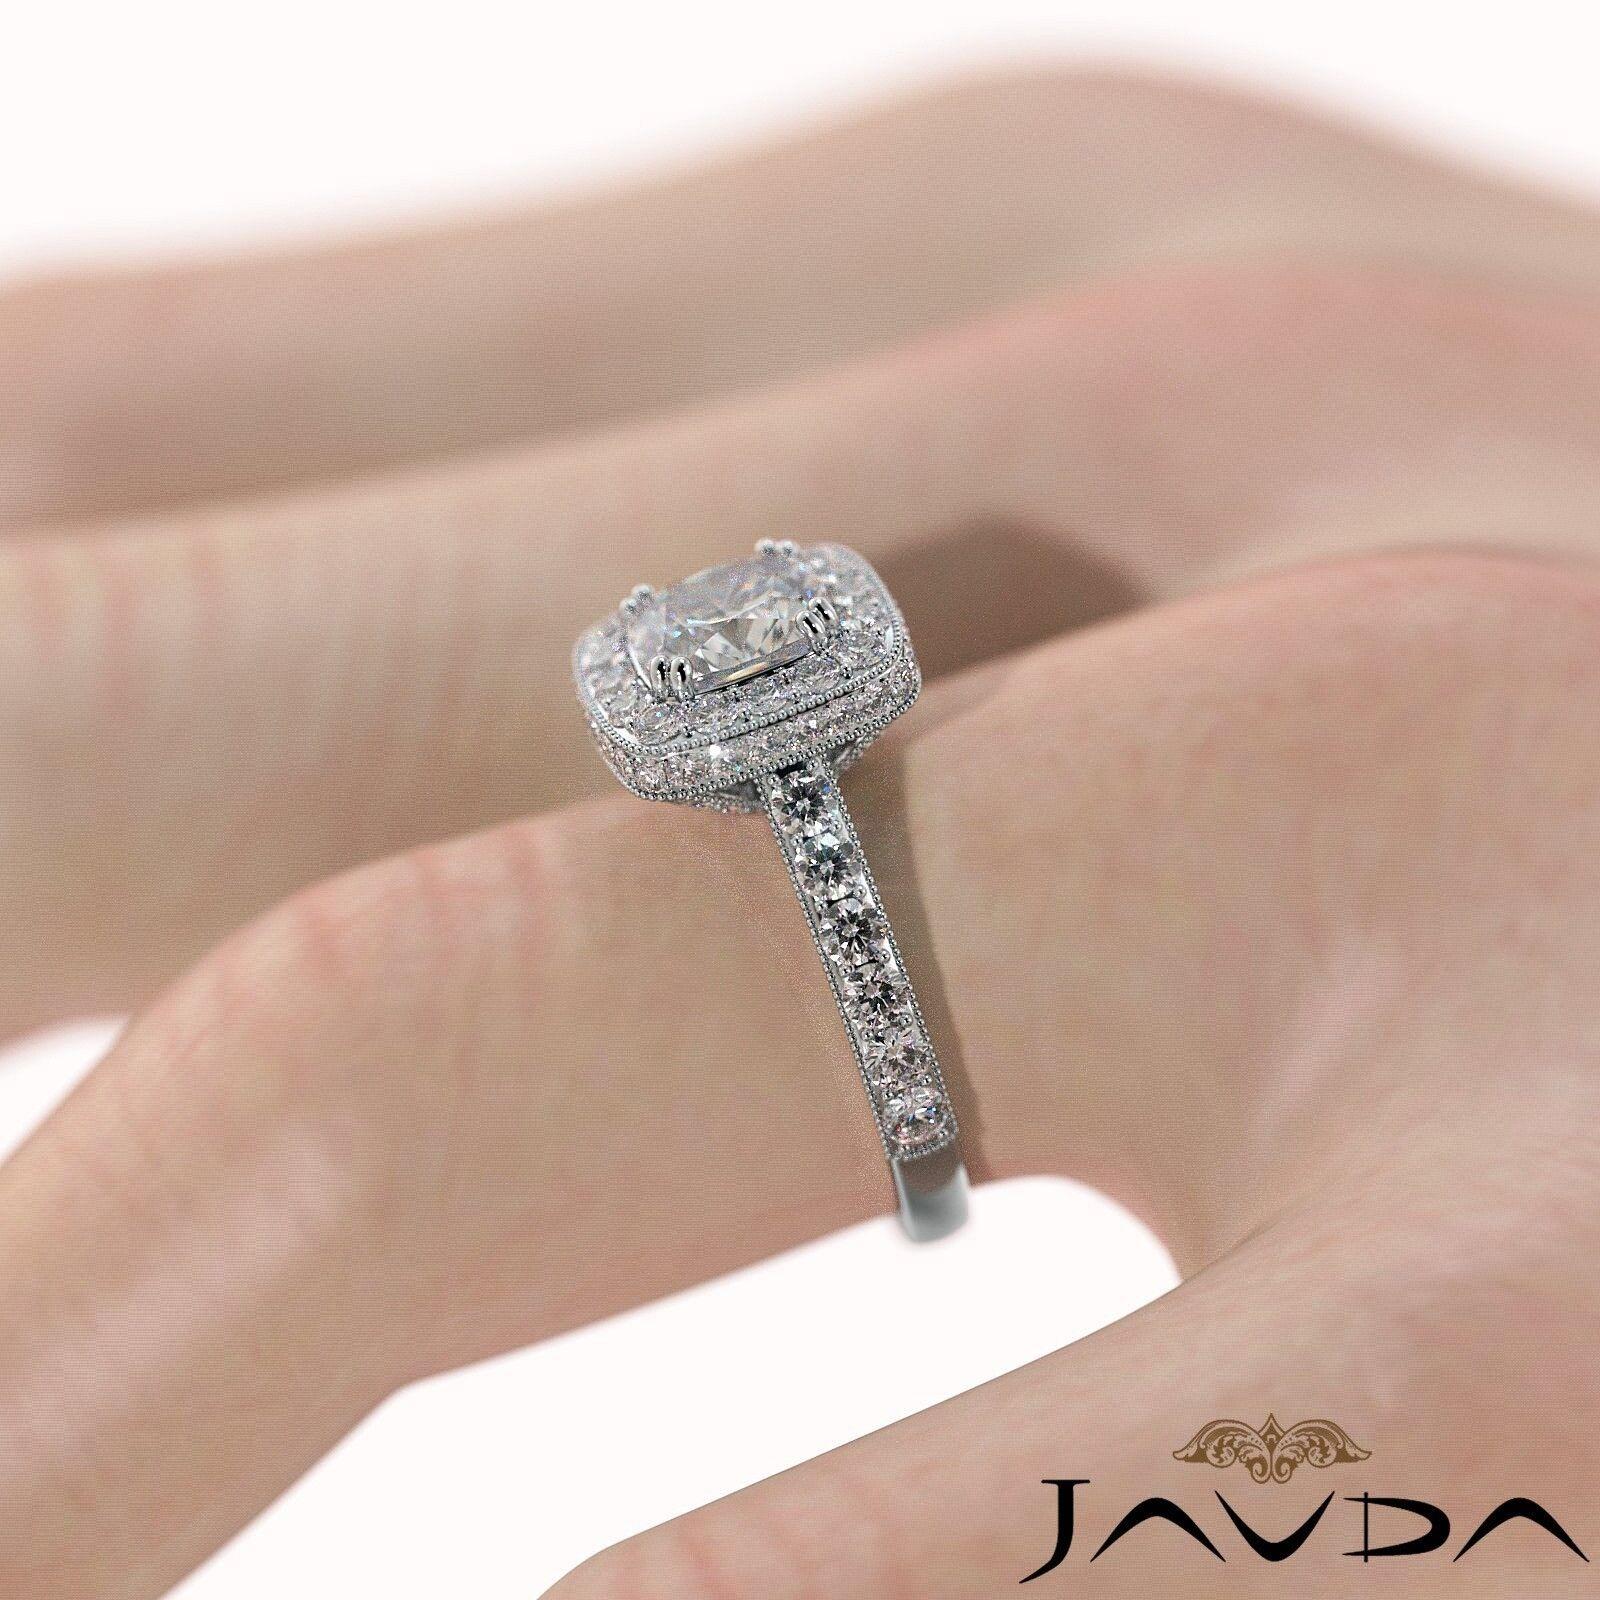 2.12ctw Milgrain Floral Basket Cushion Diamond Engagement Ring GIA I-SI2 W Gold 5